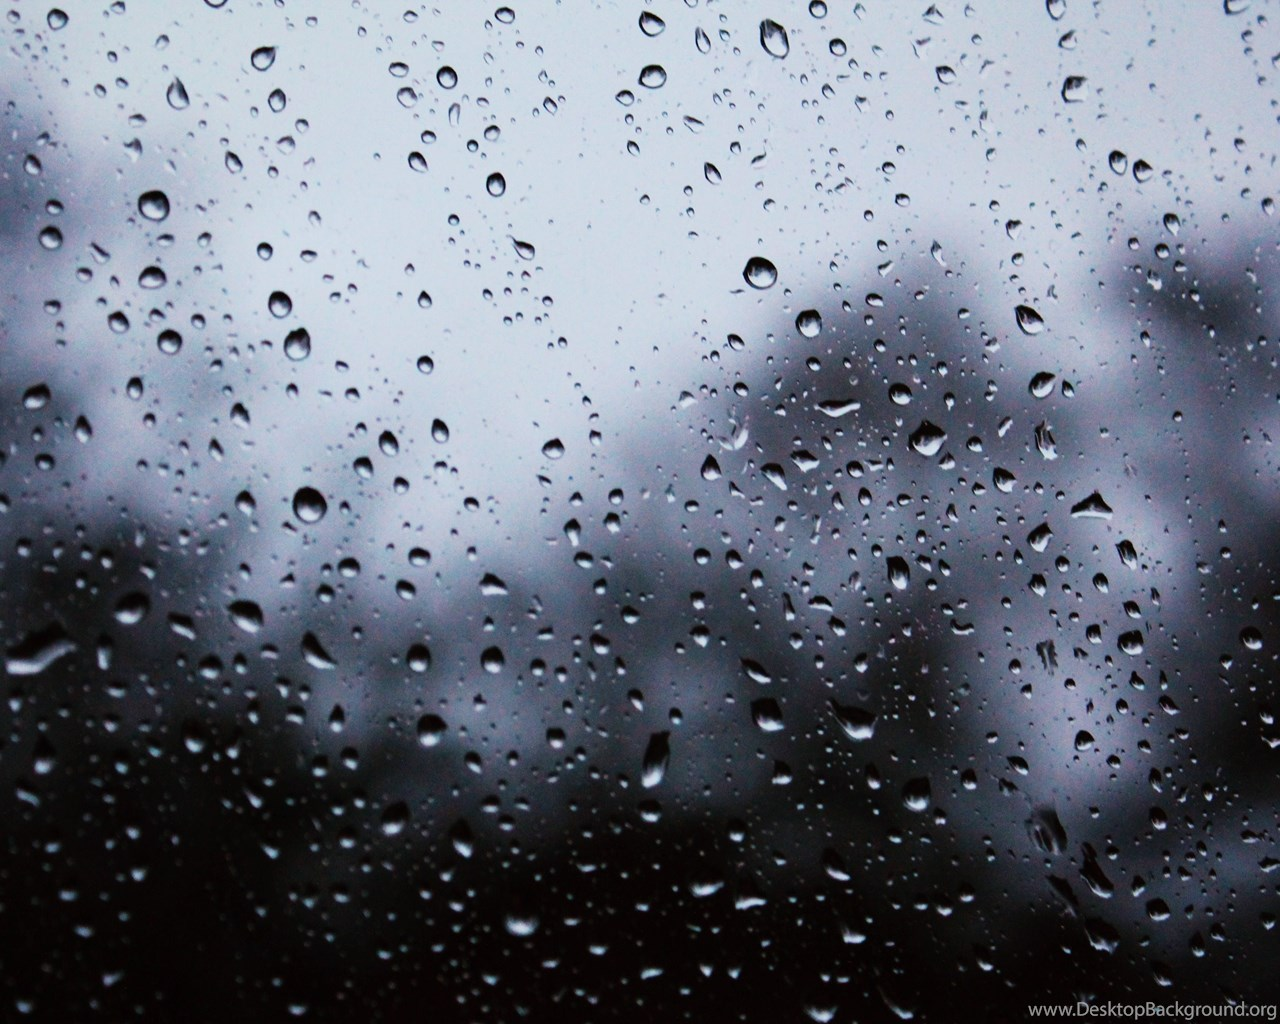 Raindrops falling desktop backgrounds wallpapers desktop background - Rain drop wallpaper hd ...